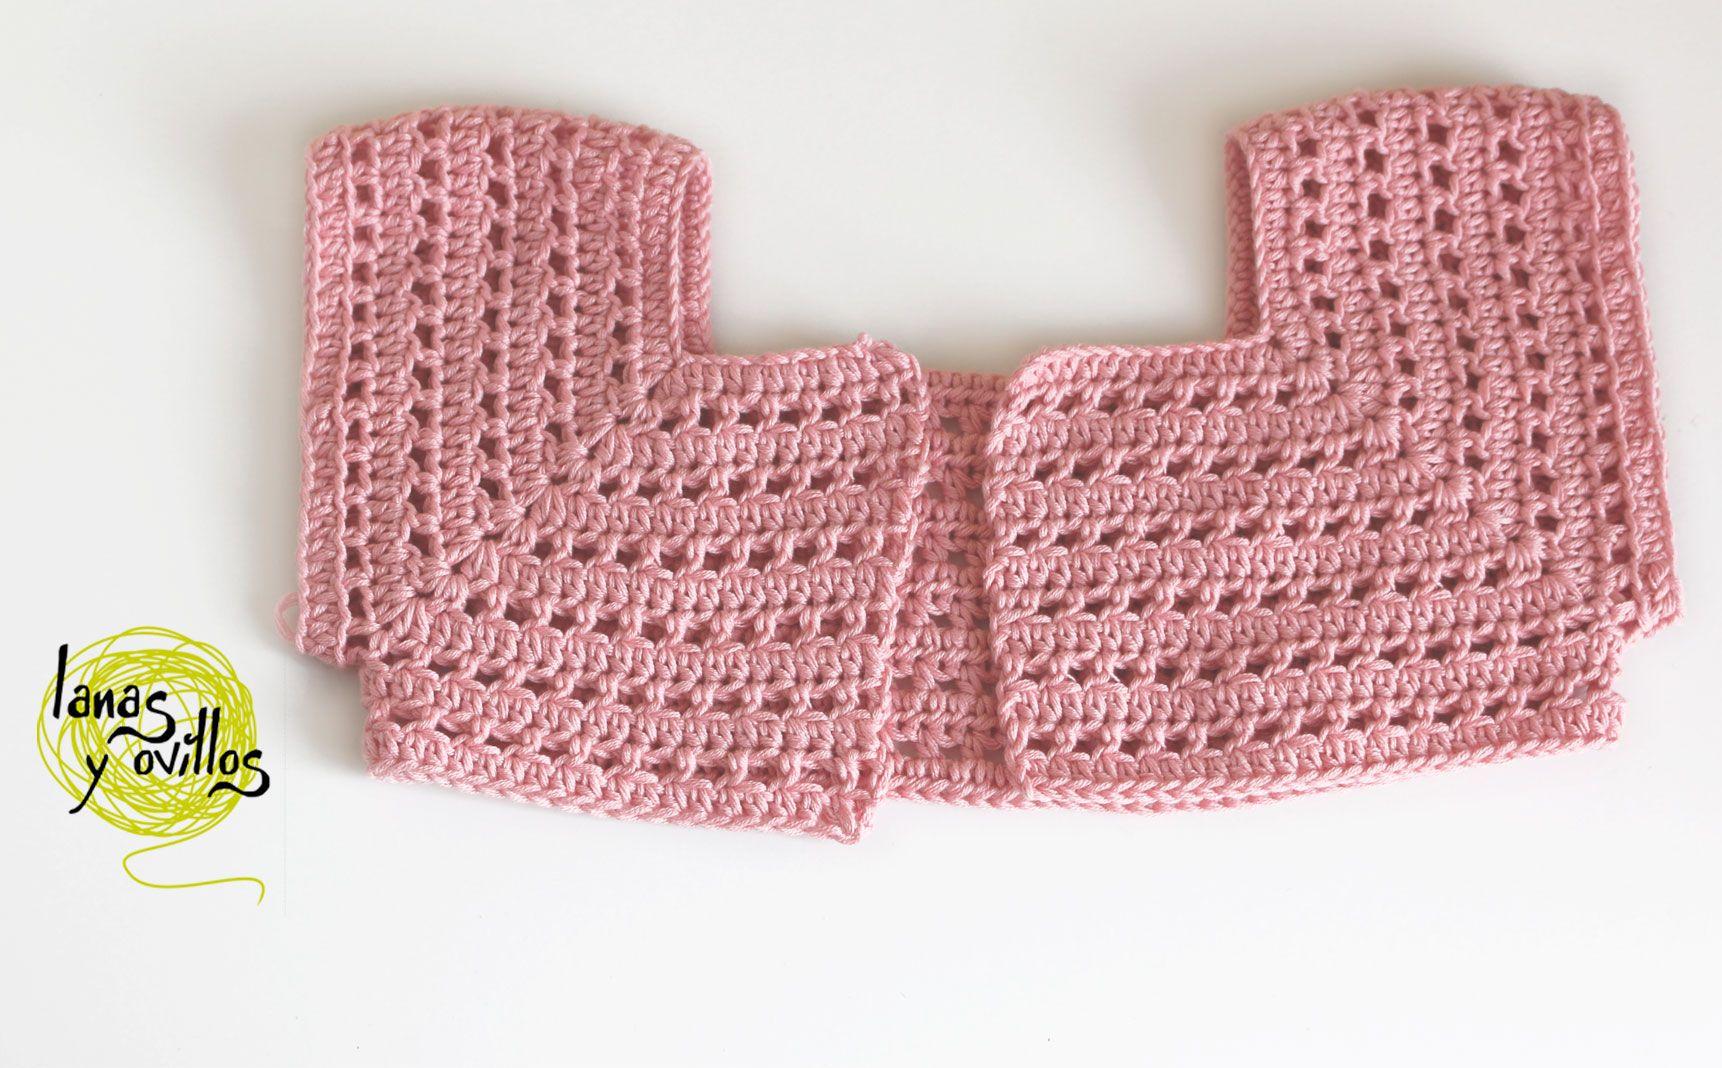 Video tutorial patrn para nia de 2 aos aprox con lana de 35mm knitting patterns bankloansurffo Image collections